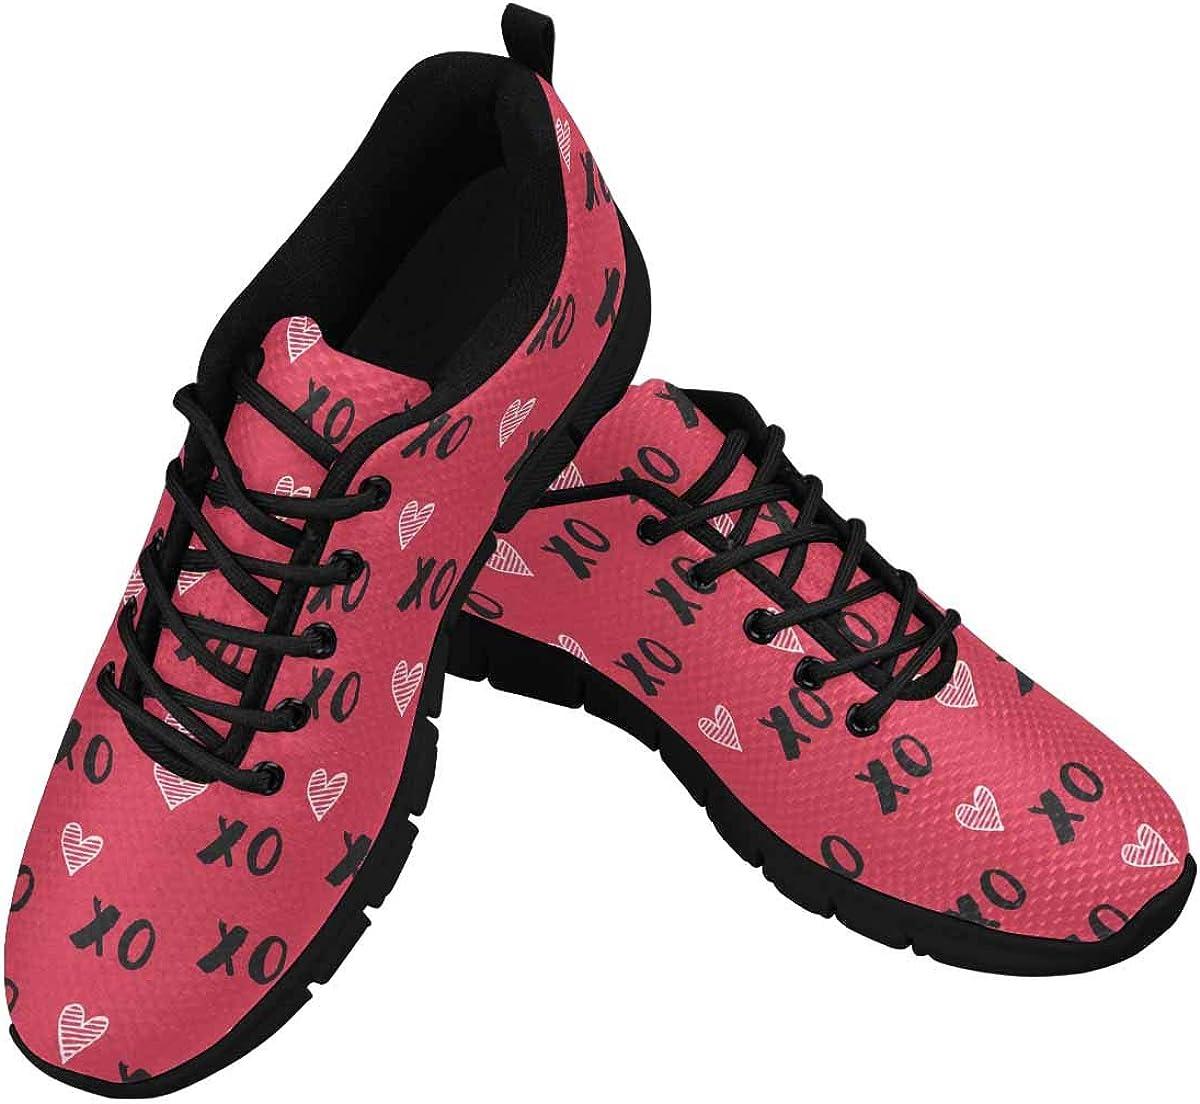 INTERESTPRINT XOXO on Red Background Women's Athletic Walking Shoes Comfort Mesh Non Slip